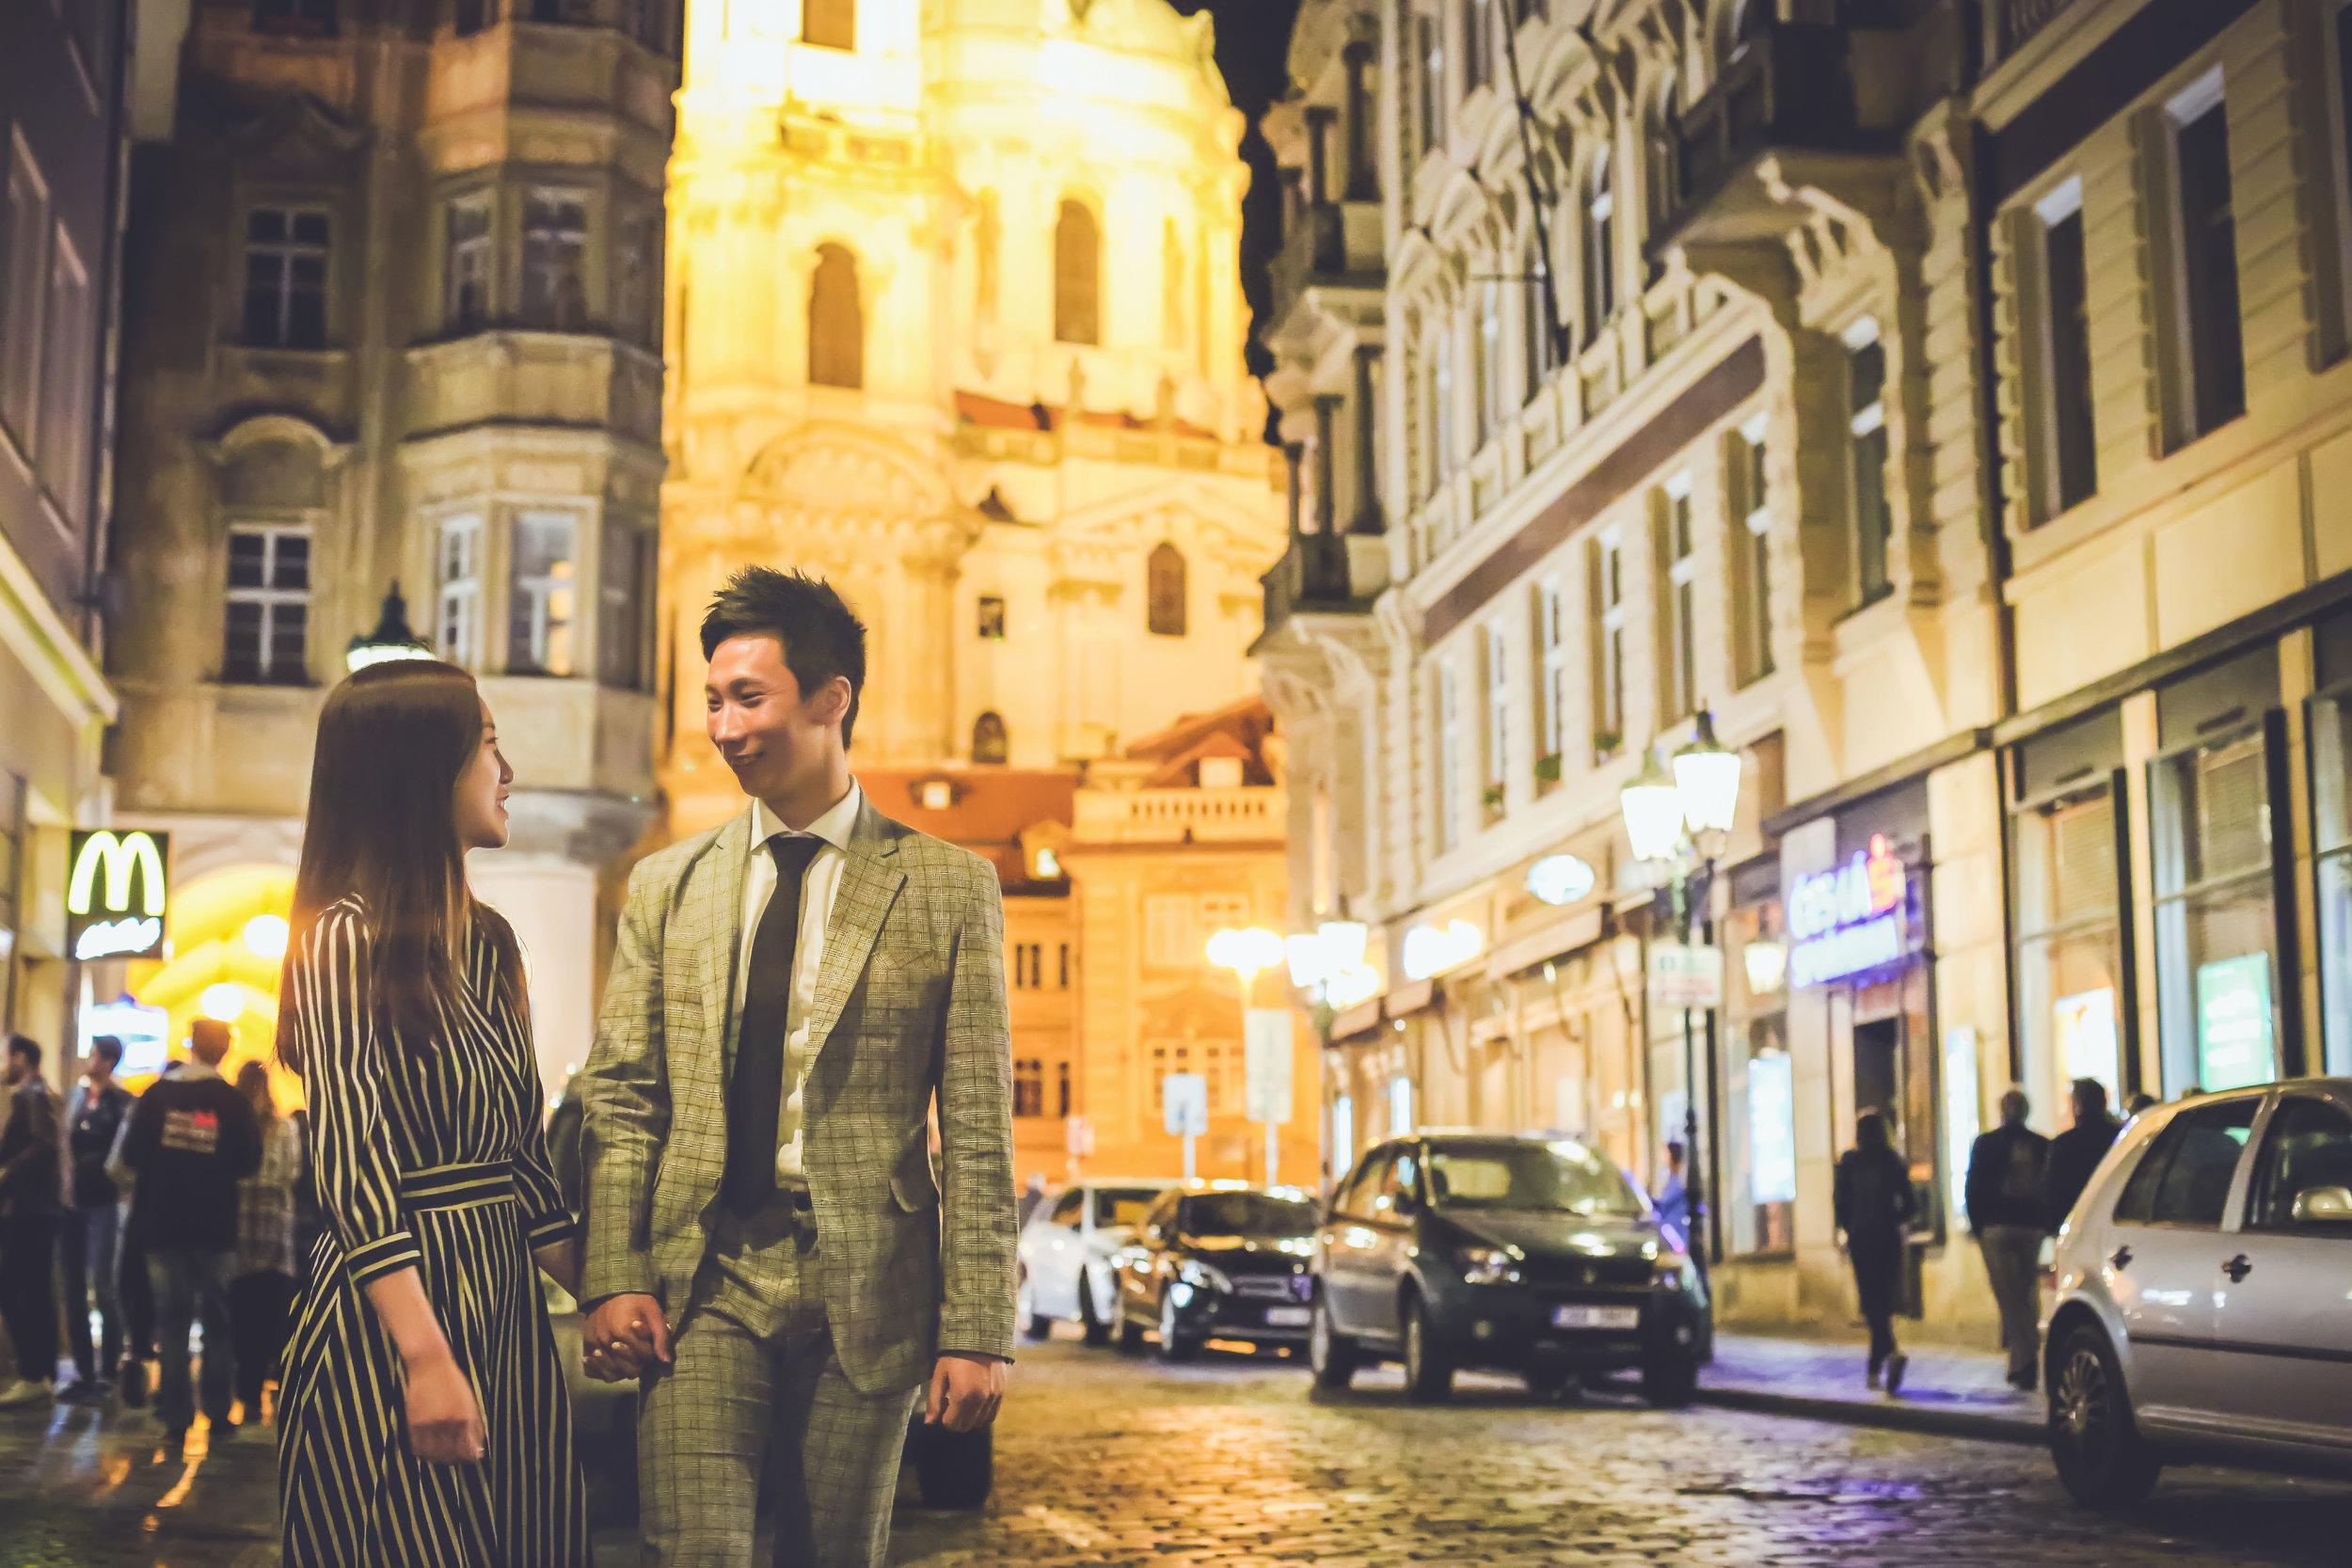 Sprazzi_Professional_Photography_Photographer_Prague_Czech-Republic_Irene_Original_8.jpg